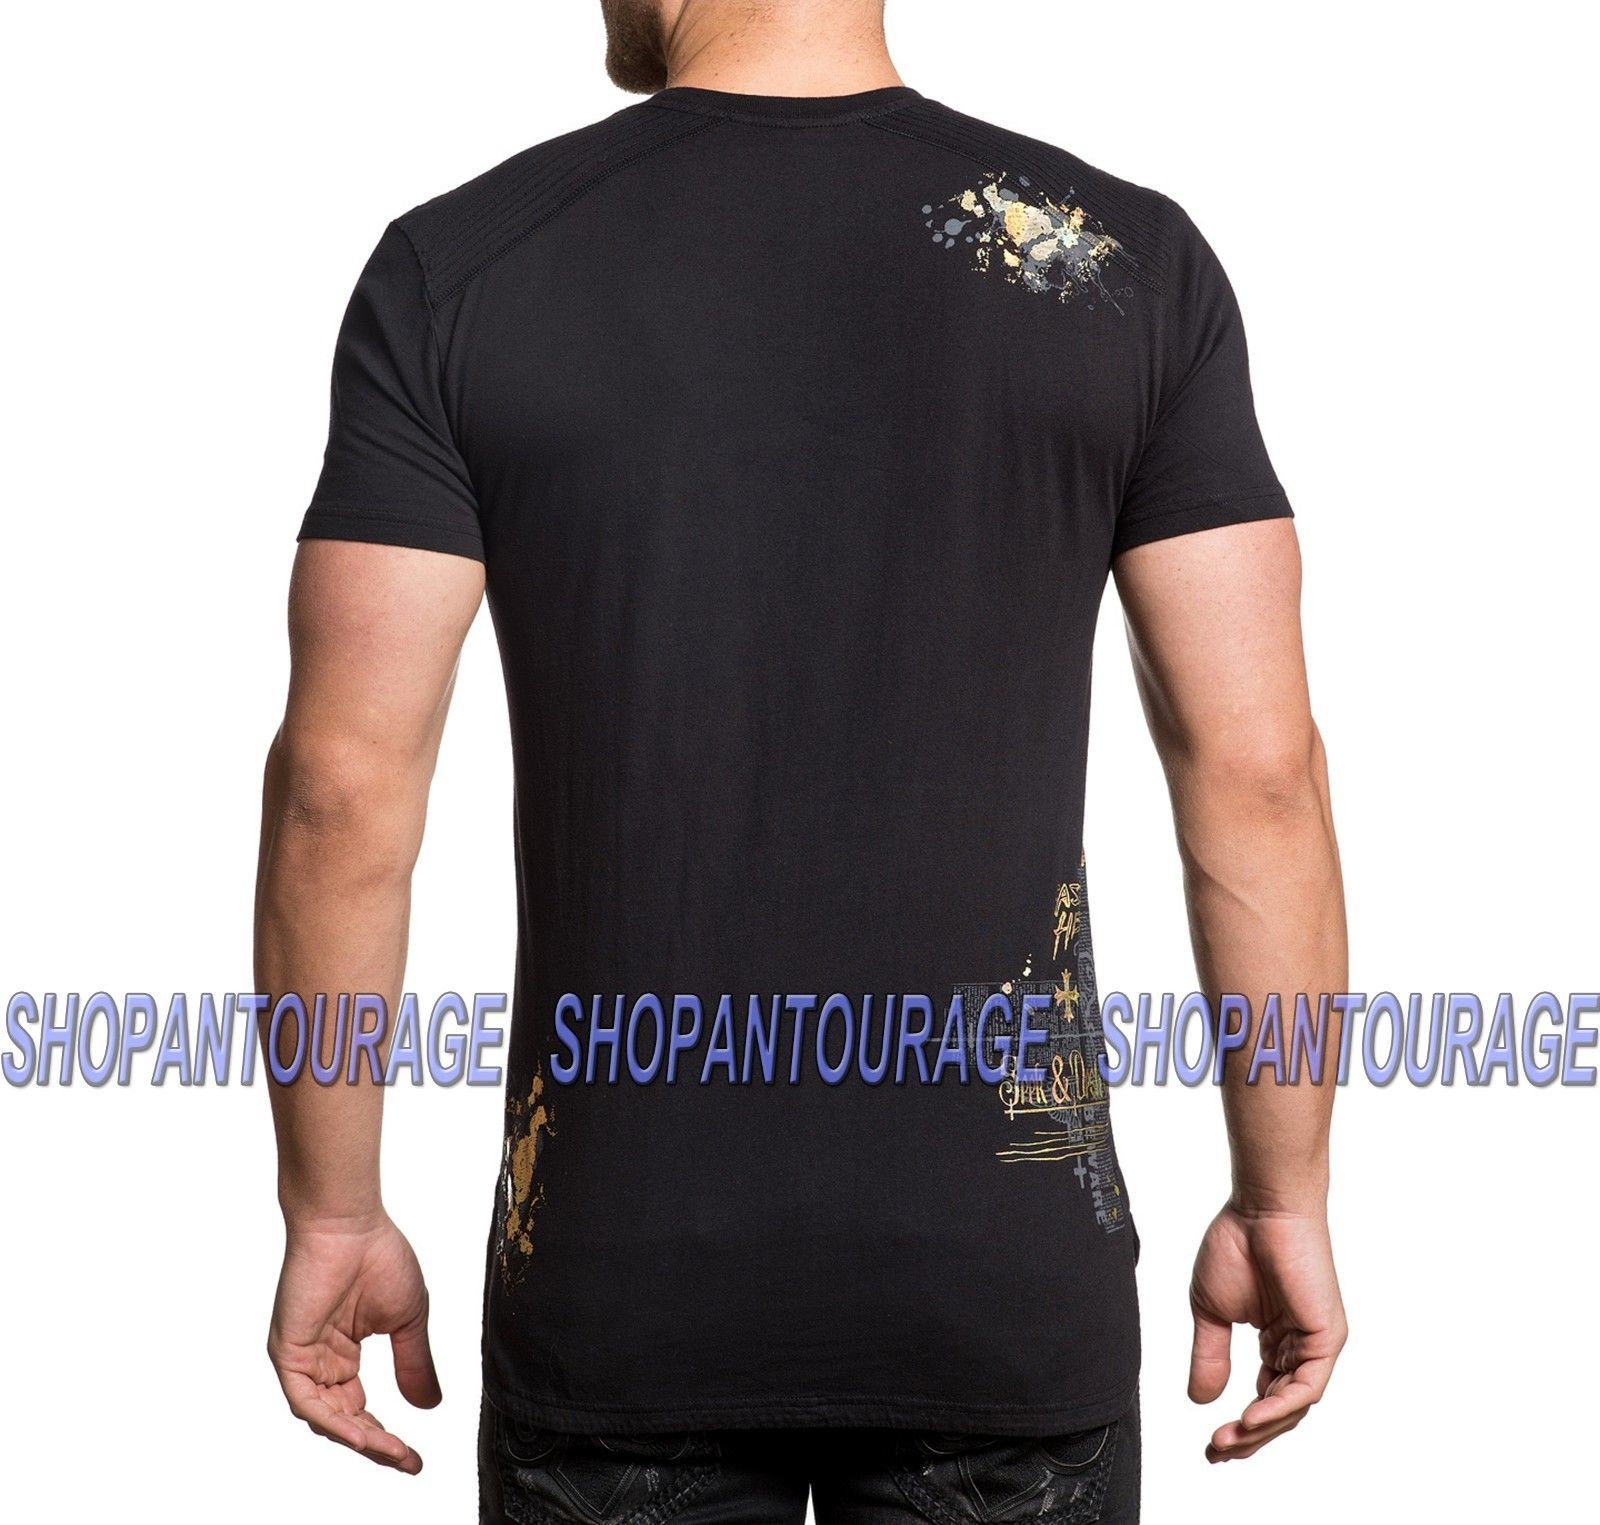 Sullen Acuna Owl SCM2277 New Graphic Tattoo Skull Fashion Artist T-shirt For Men